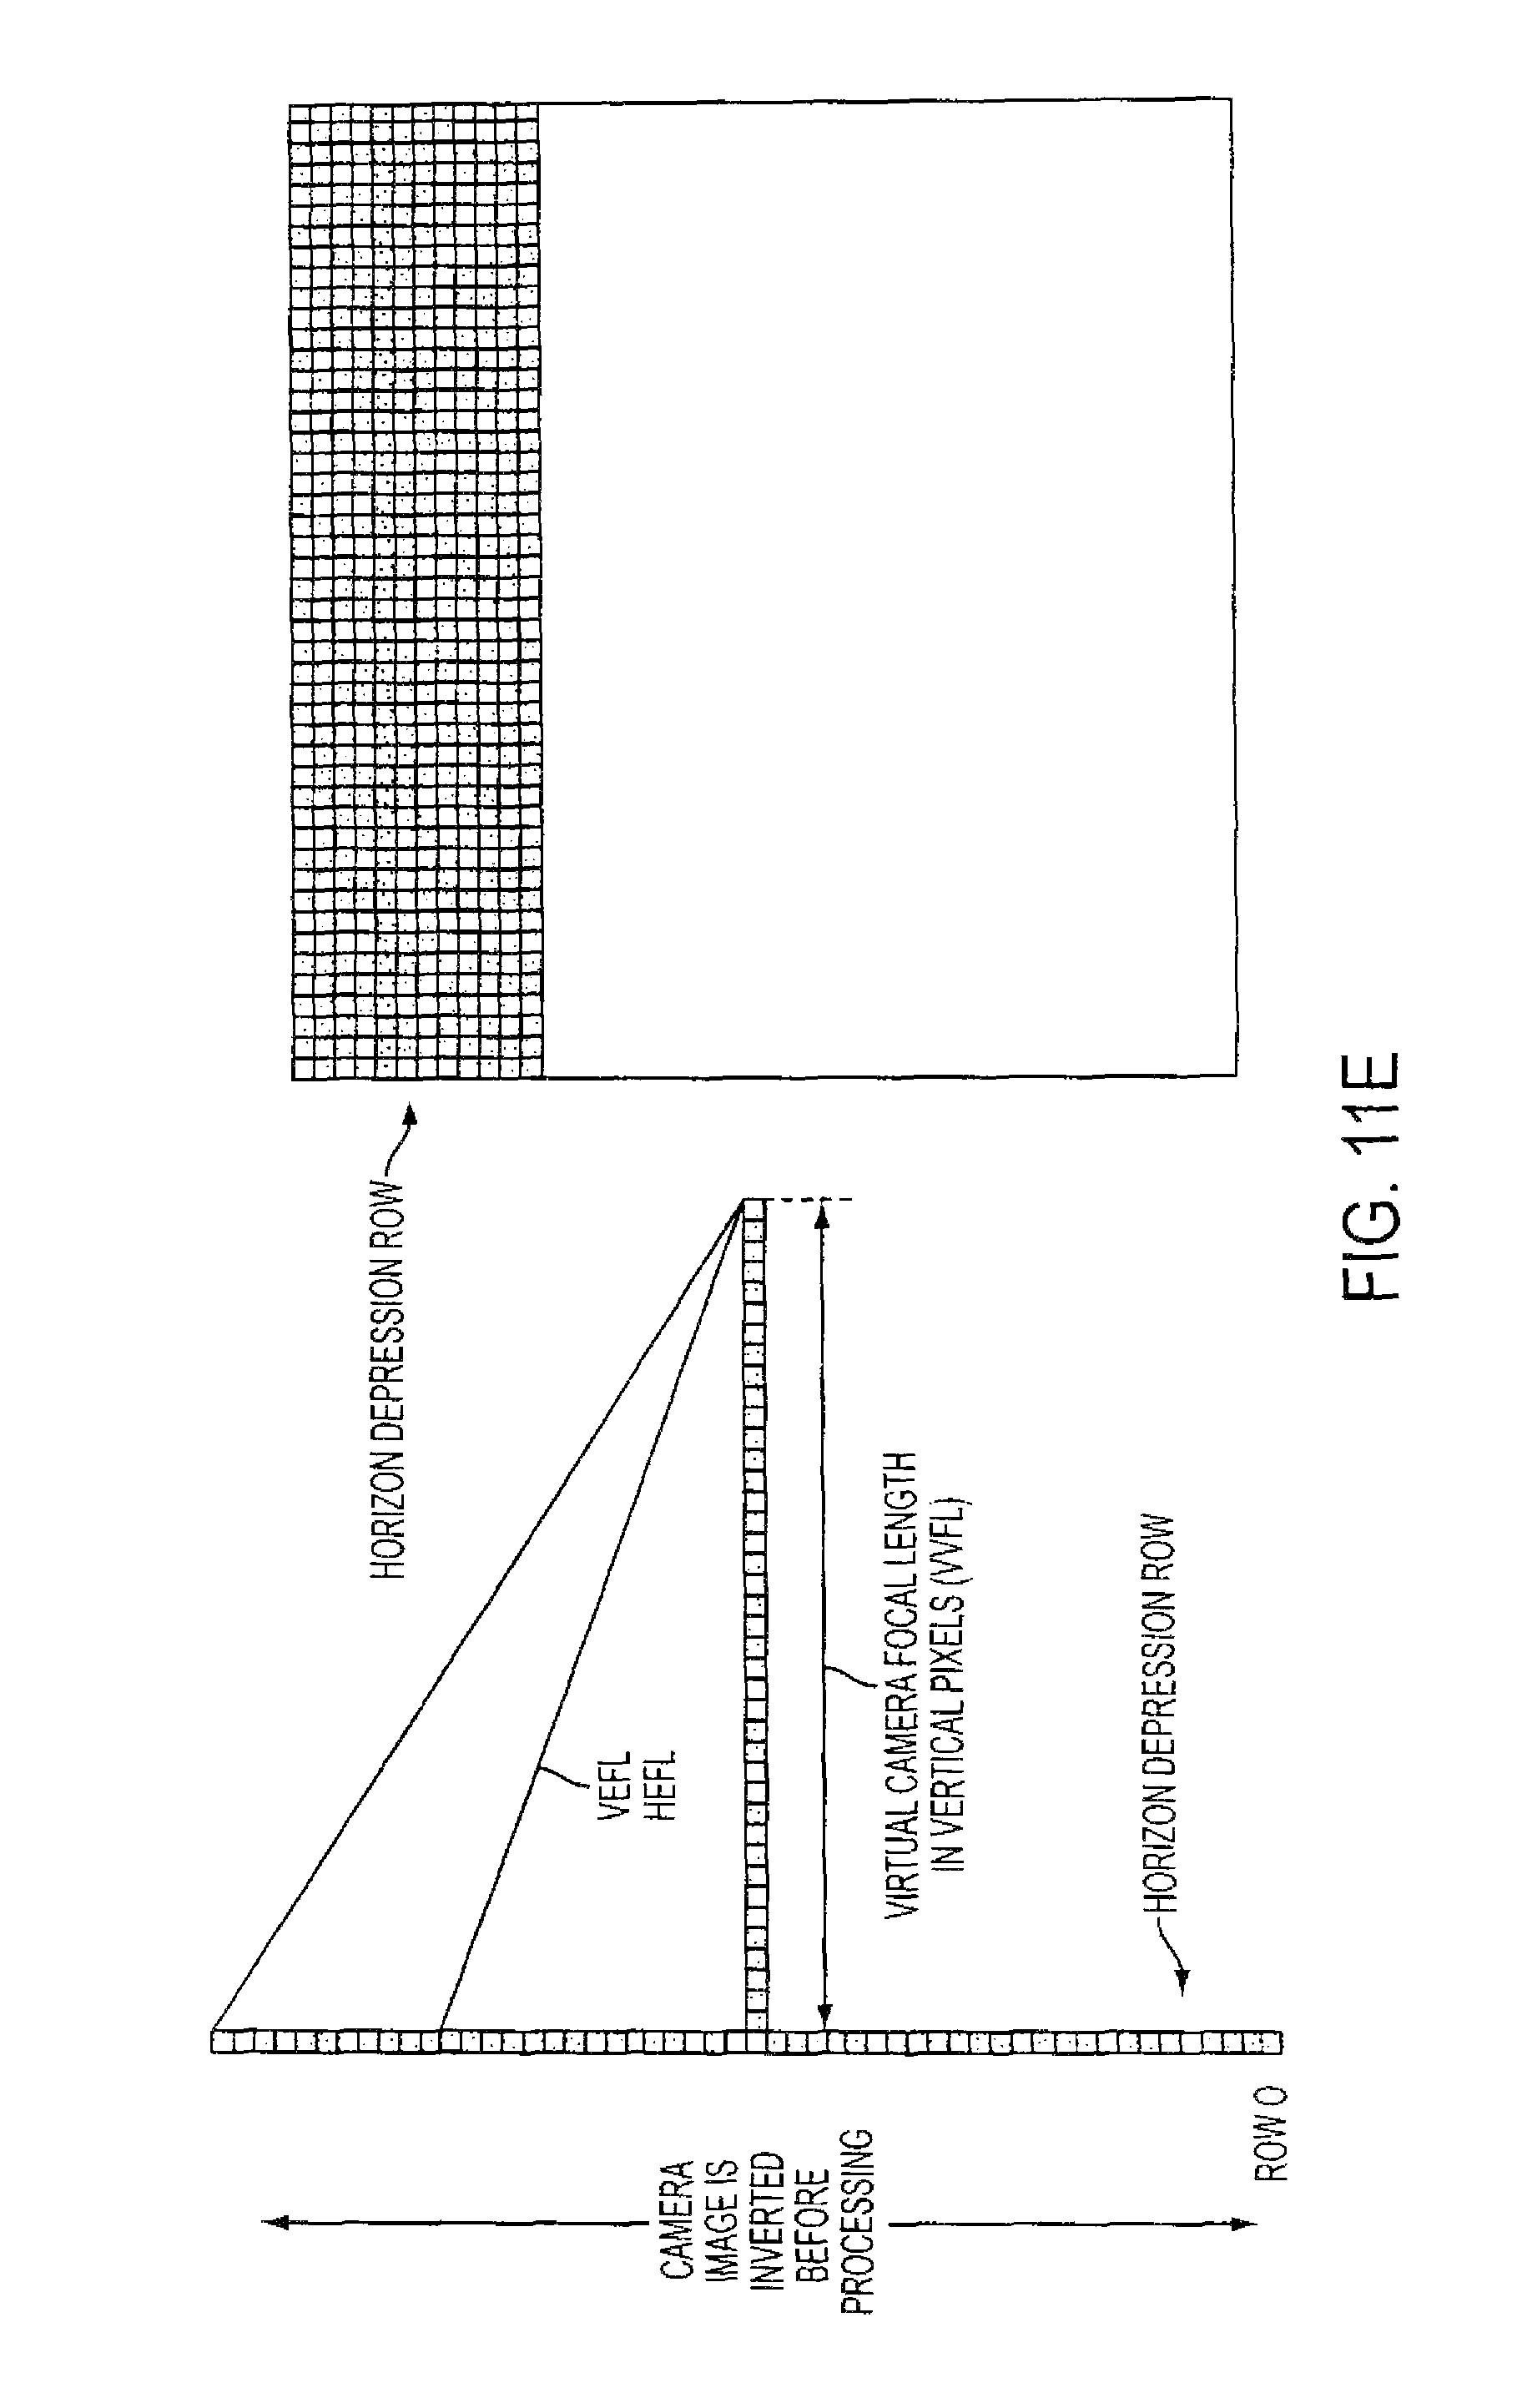 Modifying Gentex 177 Wiring Us B2 Vision System for Vehicle Google Patents Of Modifying Gentex 177 Wiring